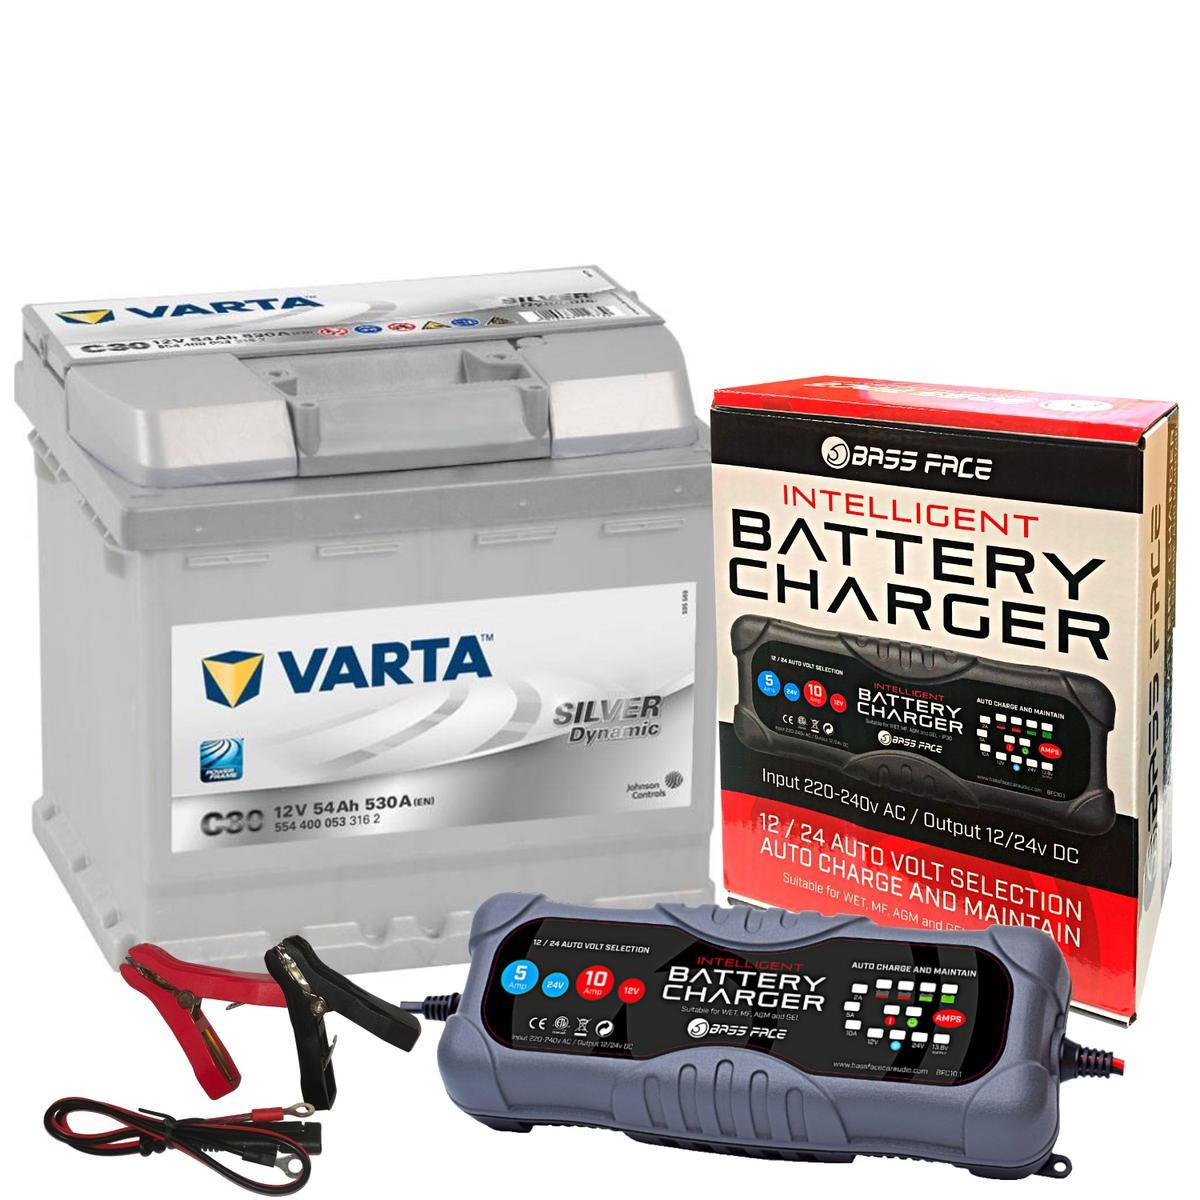 Varta C30 12v 54 AH 530 CCA 012 5 Year Warranty Car Battery W/ 10 Amp Charger